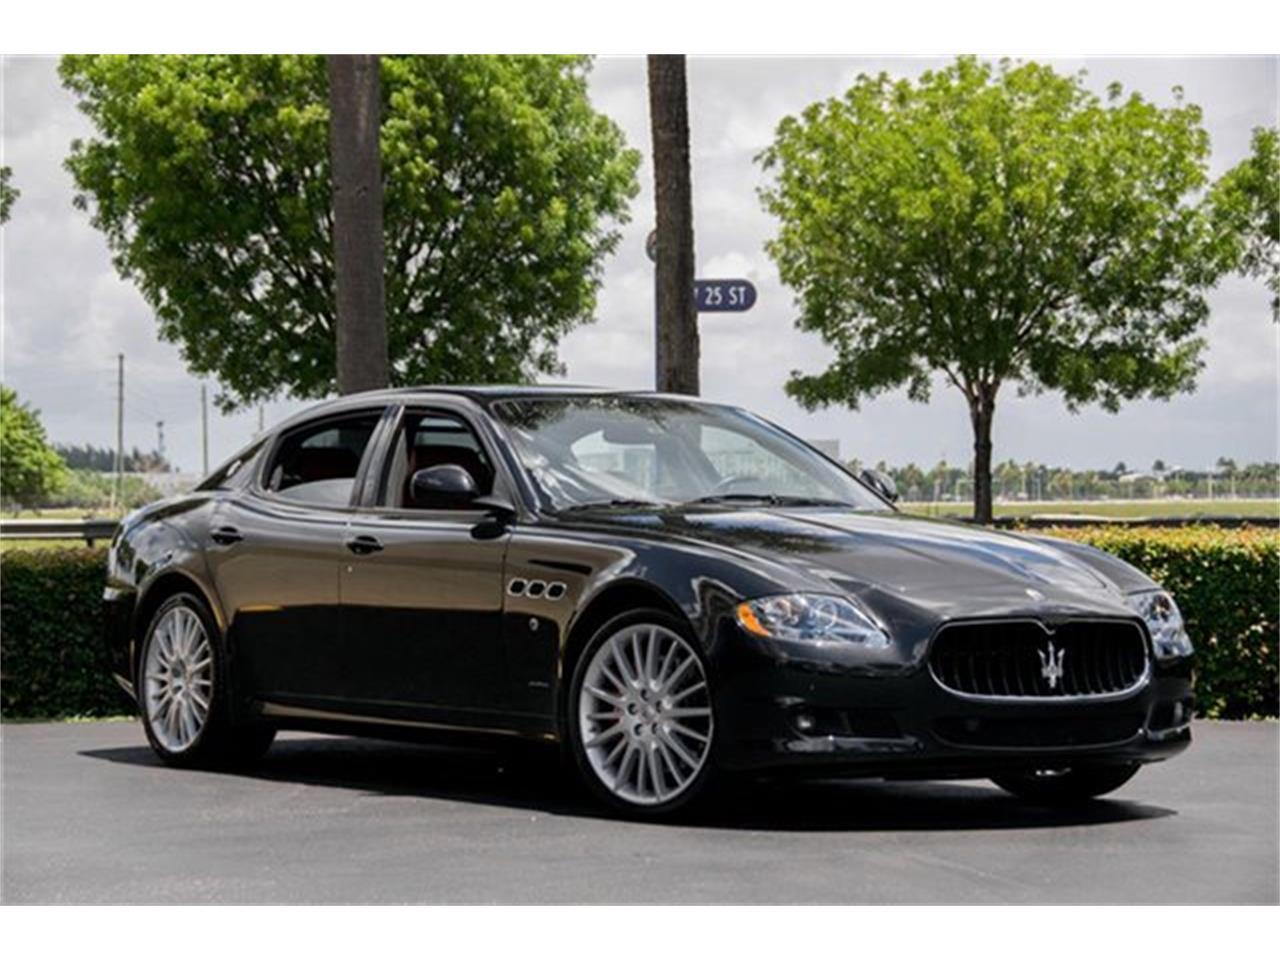 2012 Maserati Quattroporte for Sale | ClassicCars.com | CC ...